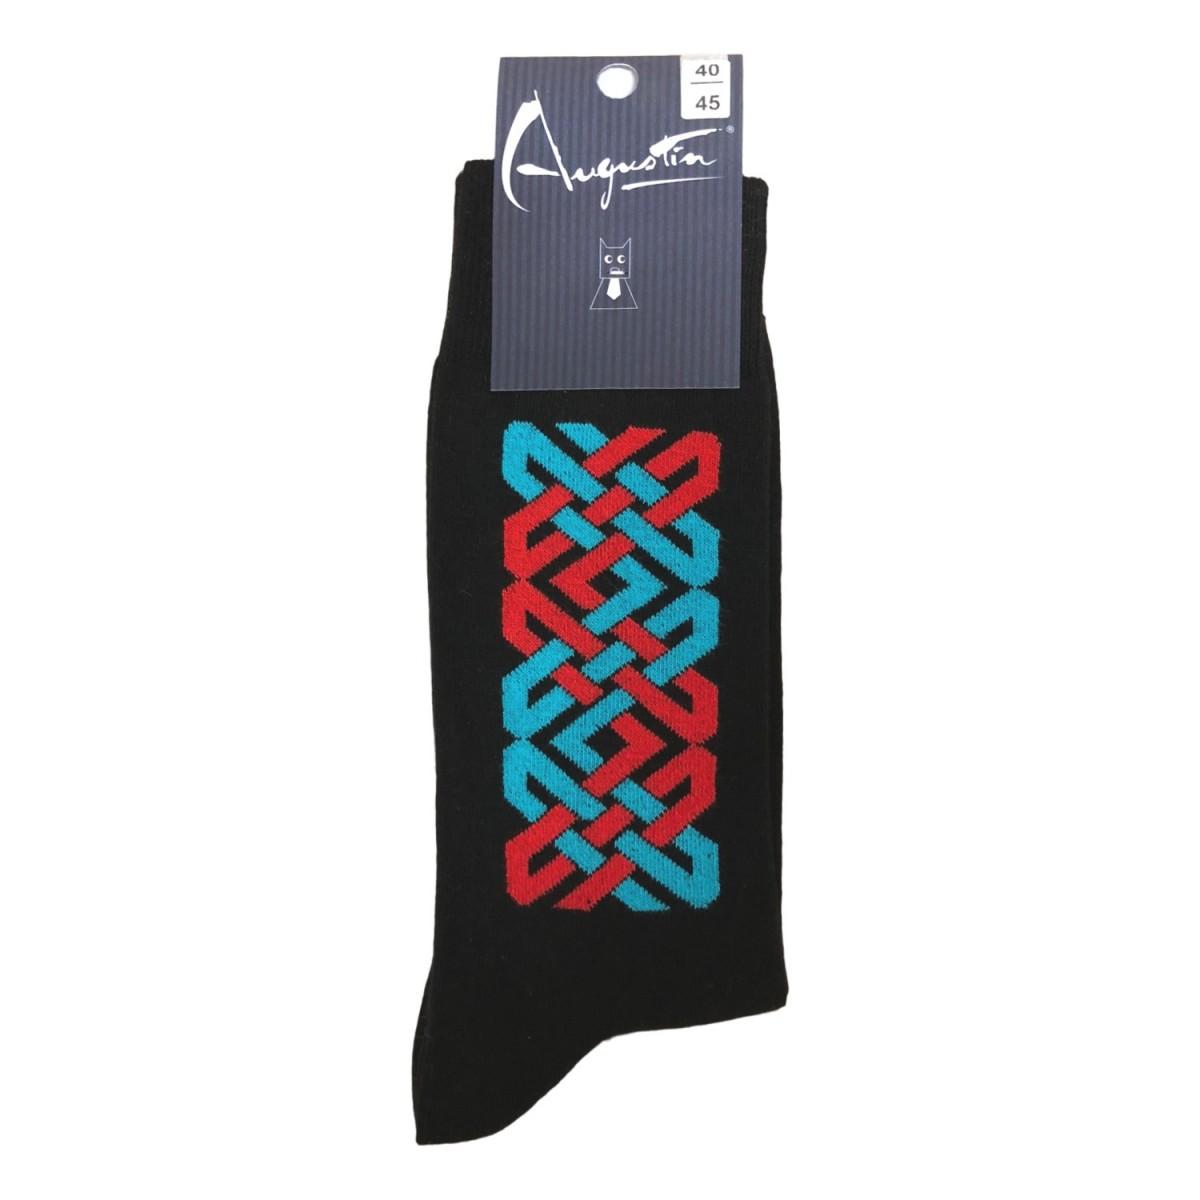 https://www.boutique-augustin.com/1381-thickbox/chaussettes-entrelac.jpg